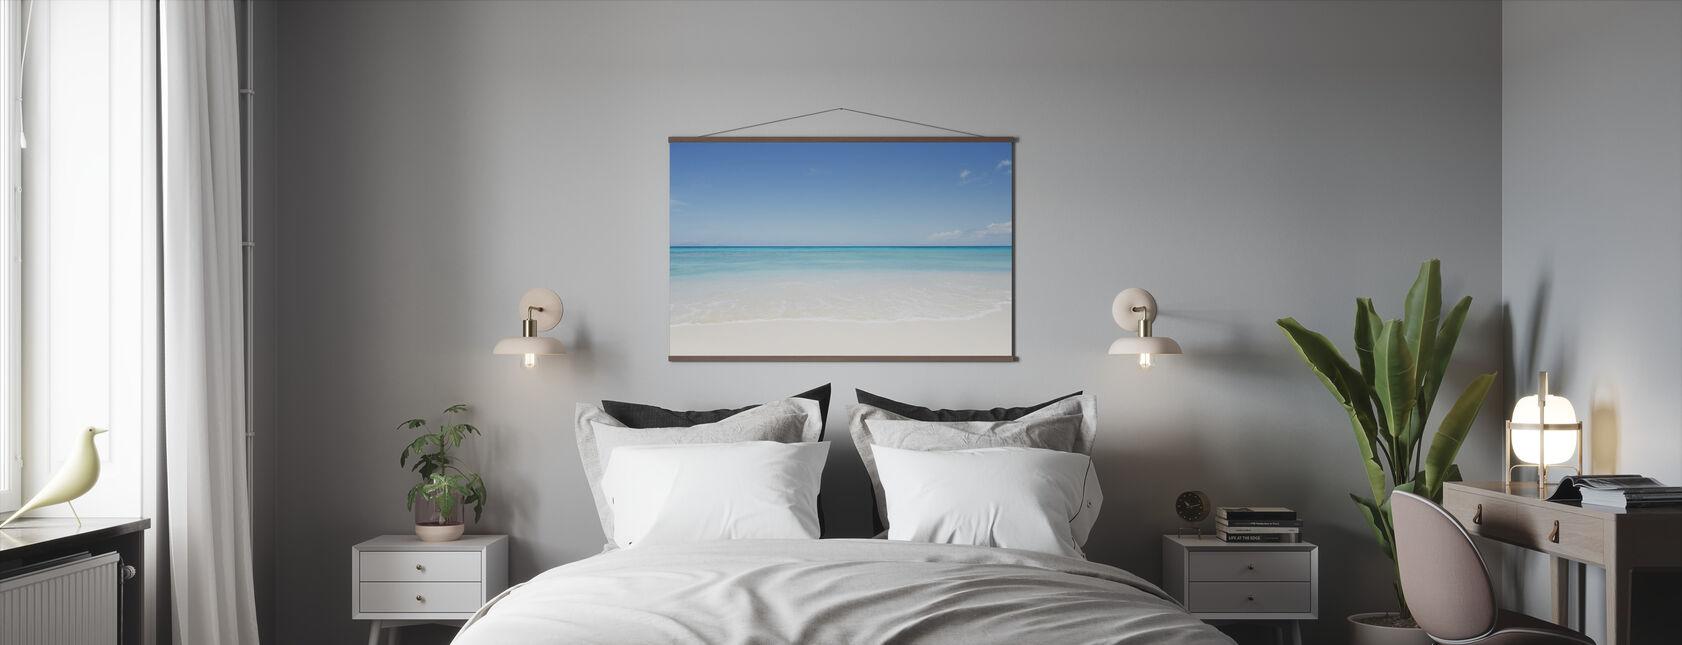 Perfekter Horizont - Poster - Schlafzimmer